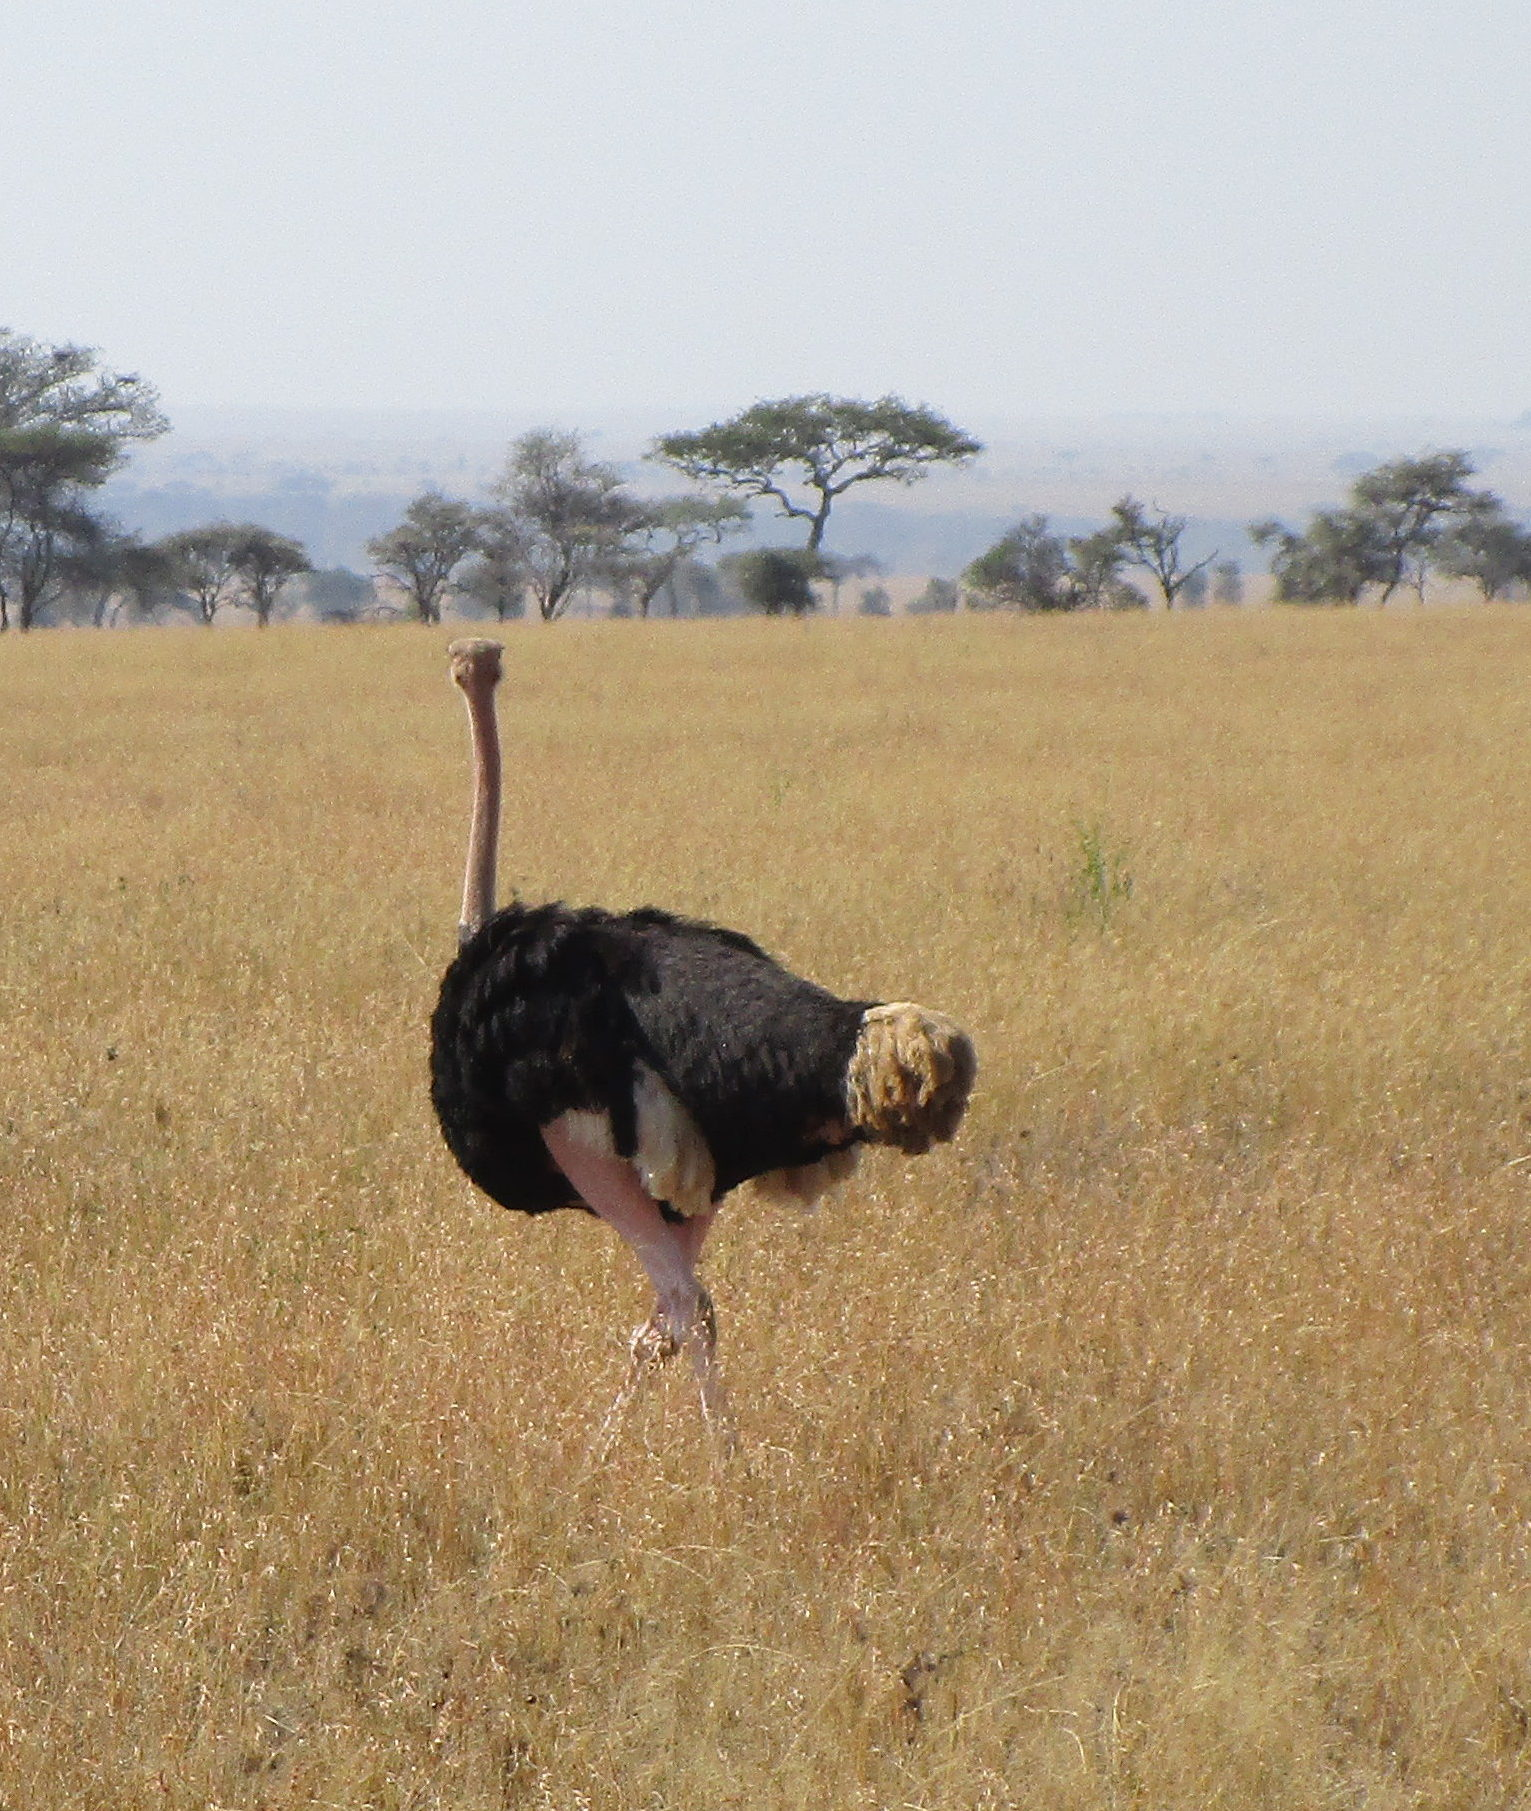 Ostrich Serengeti National Park